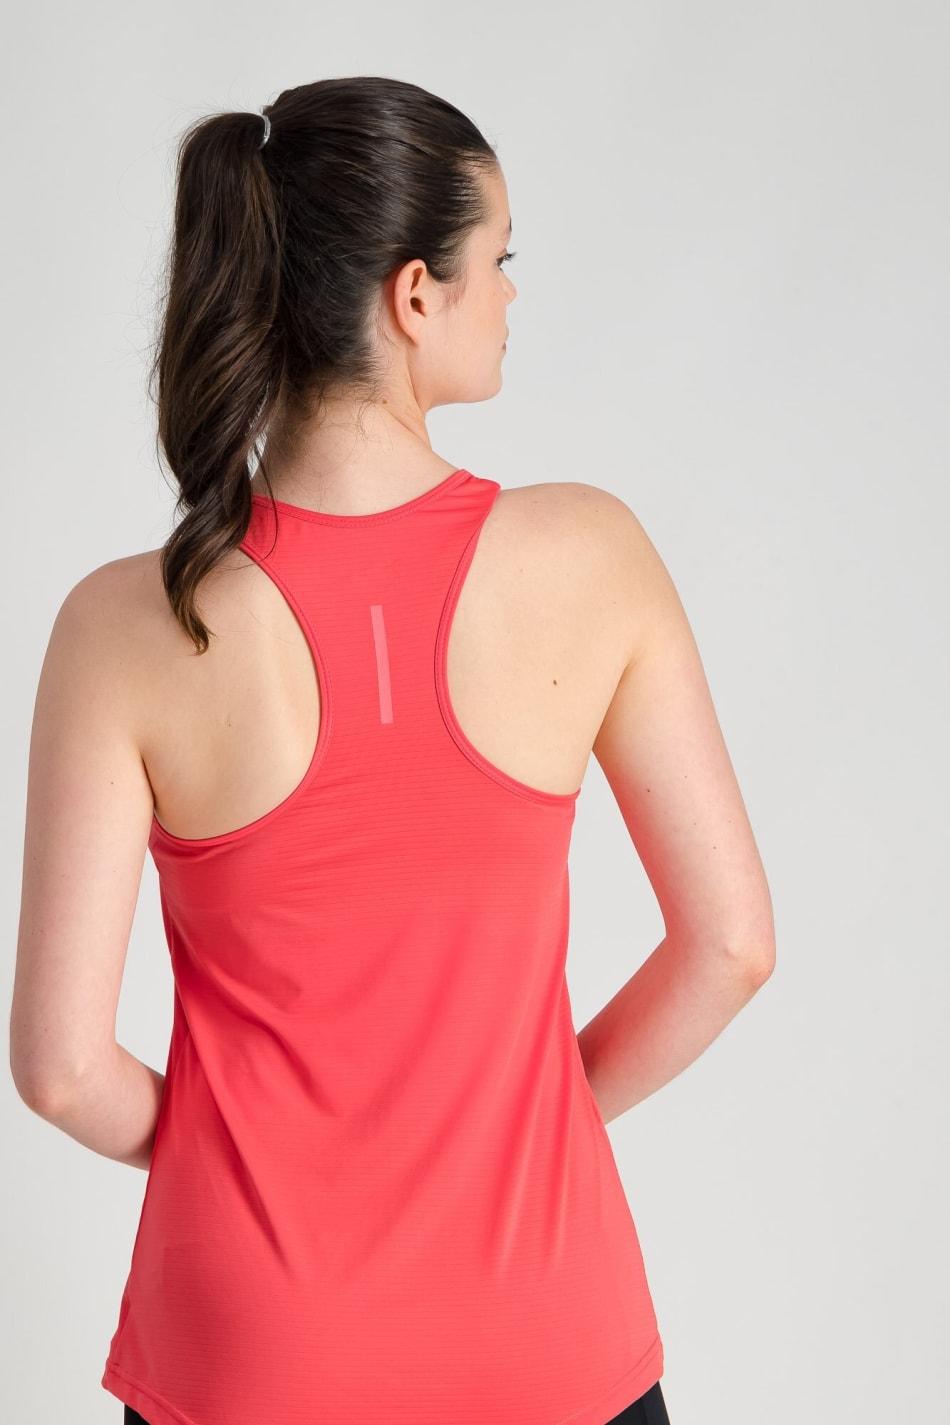 Capestorm Women's Stride Run Vest, product, variation 5